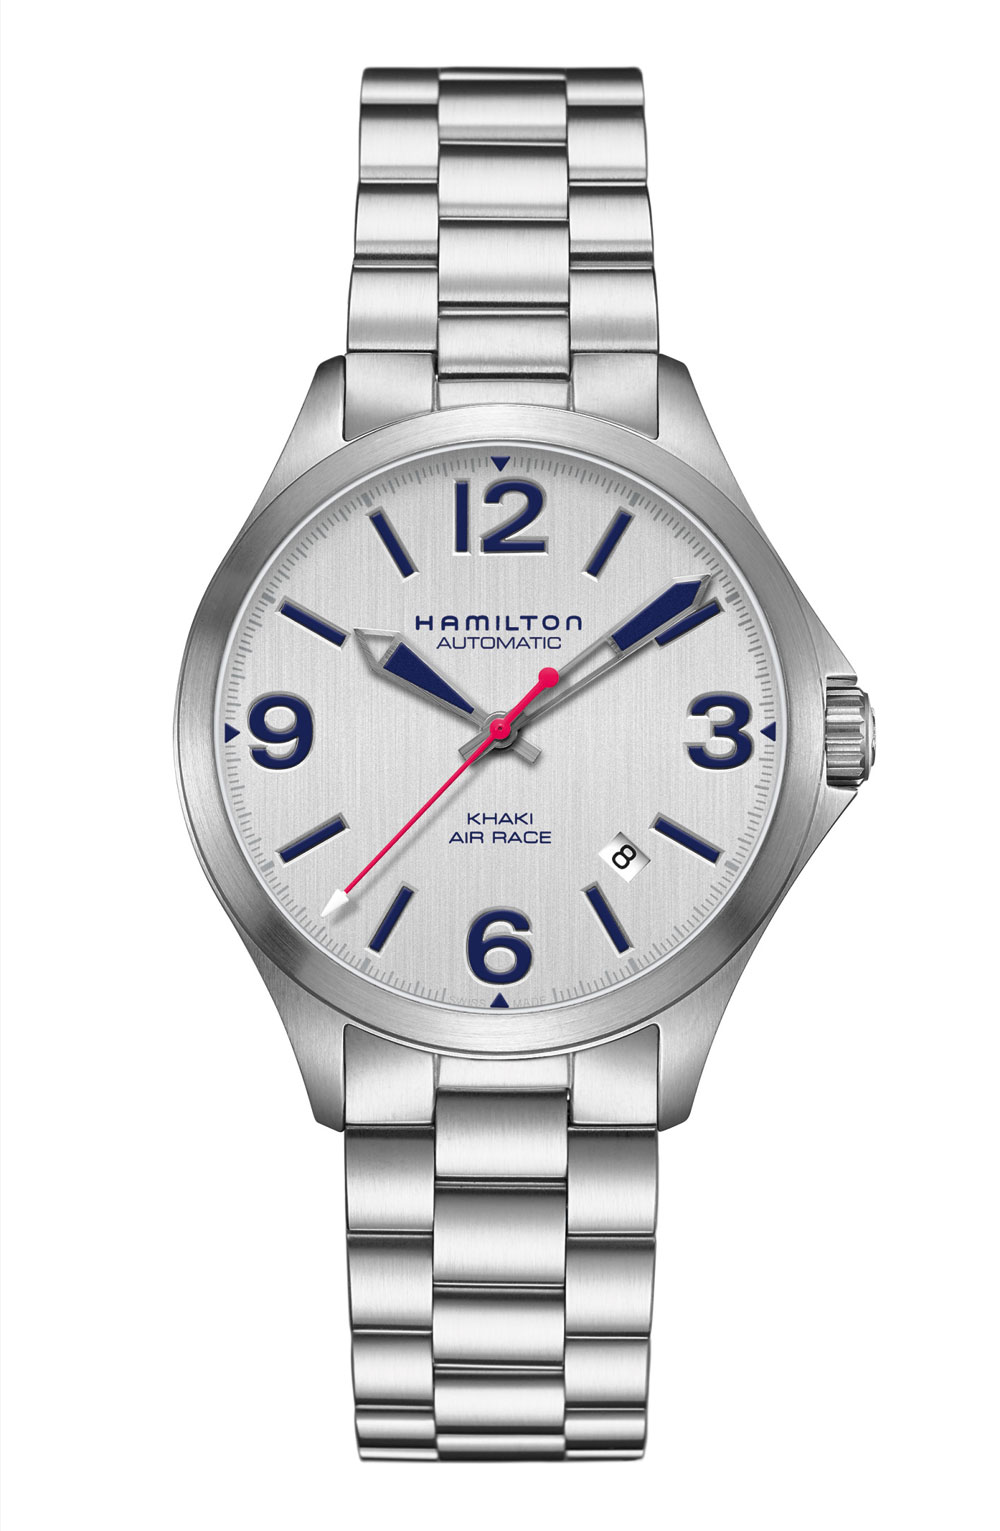 Reloj Khaki Air Race Official Timekeeper